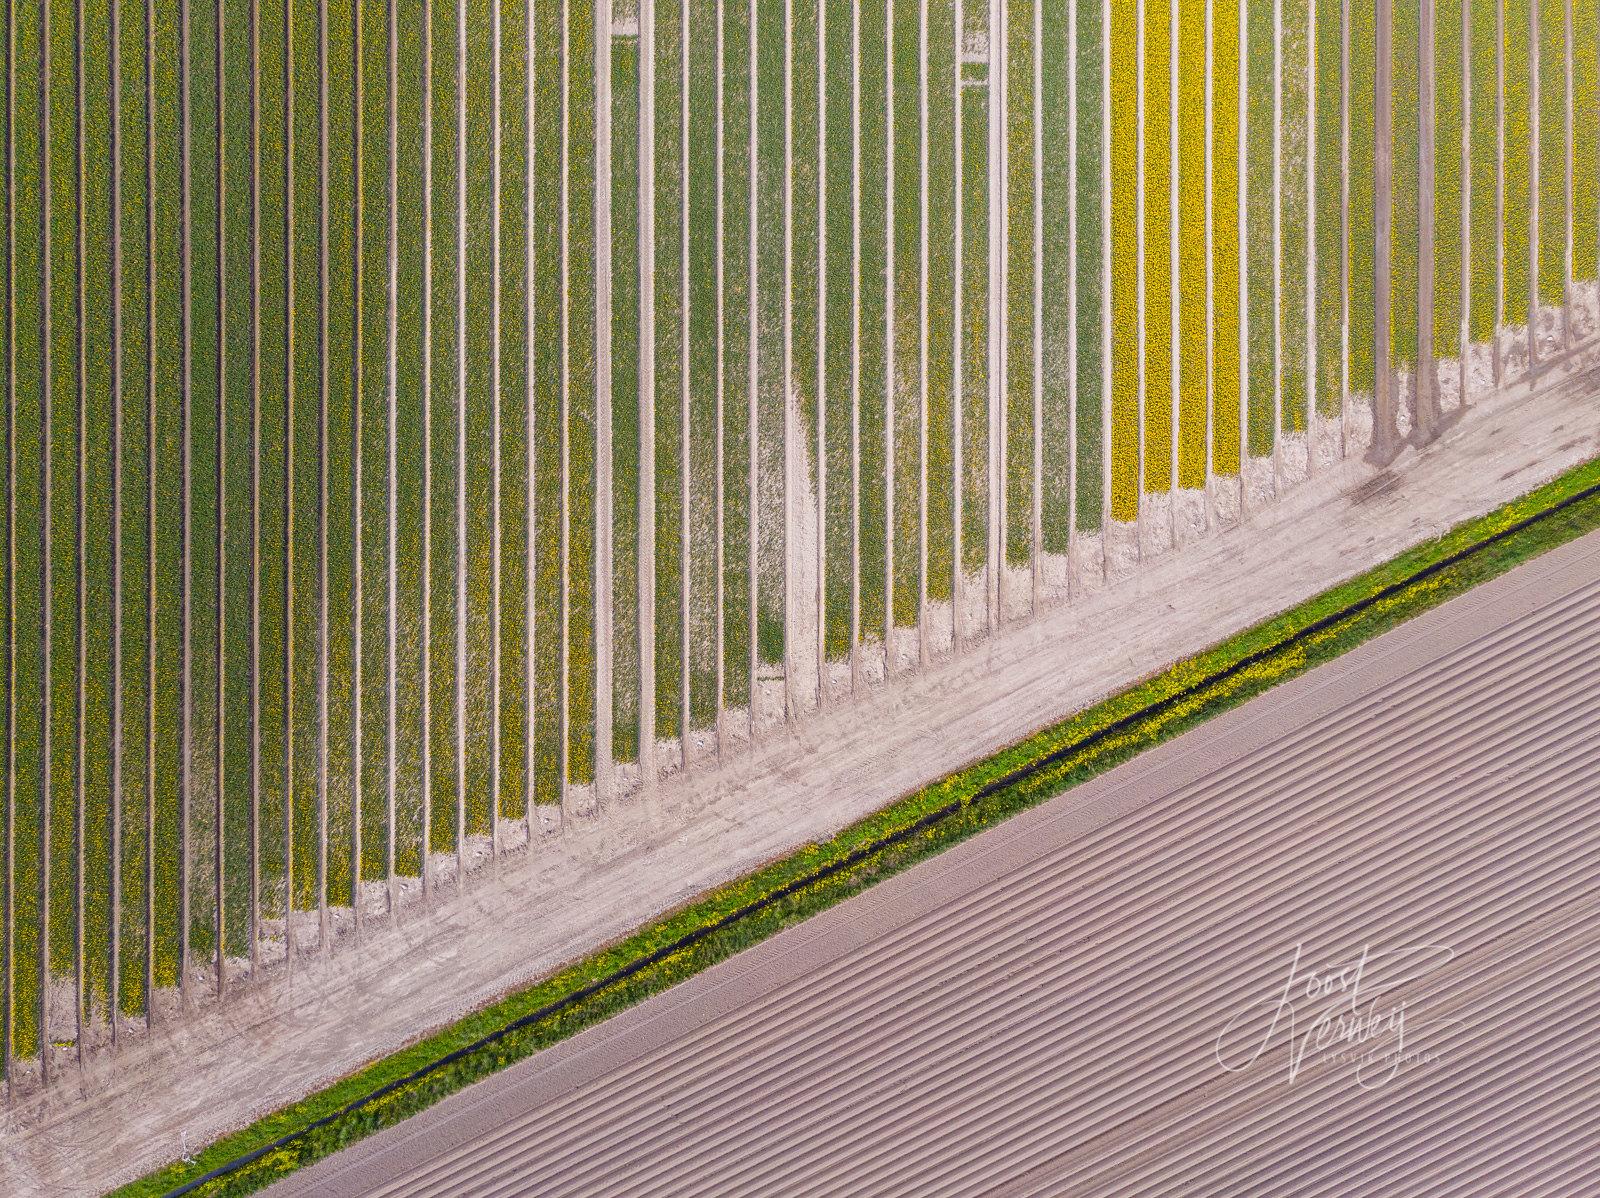 Landscape patterns #11